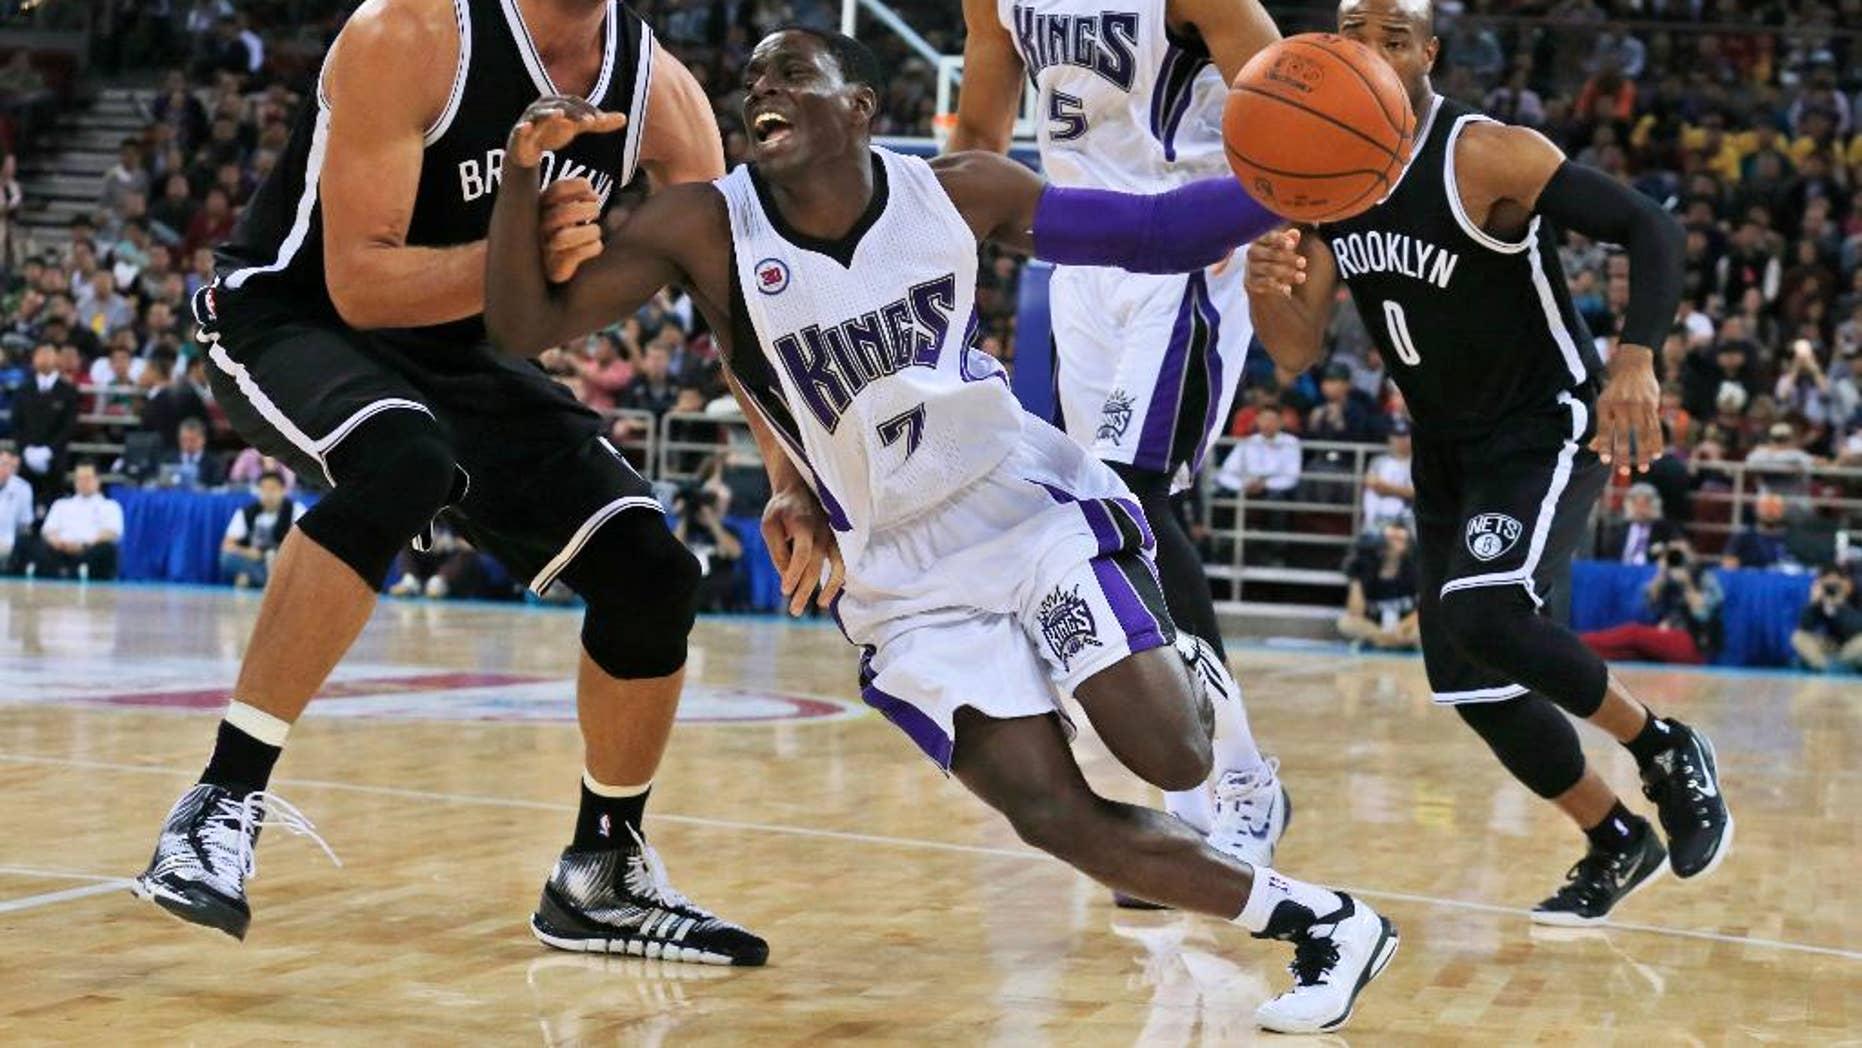 Sacramento Kings' Darren Collison, center, tries to pass Brooklyn Nets' Brook Lopez, left, during a pre-season match held in Beijing, China, Wednesday, Oct. 15, 2014. Brooklyn Nets won 129-117. (AP Photo/Ng Han Guan)